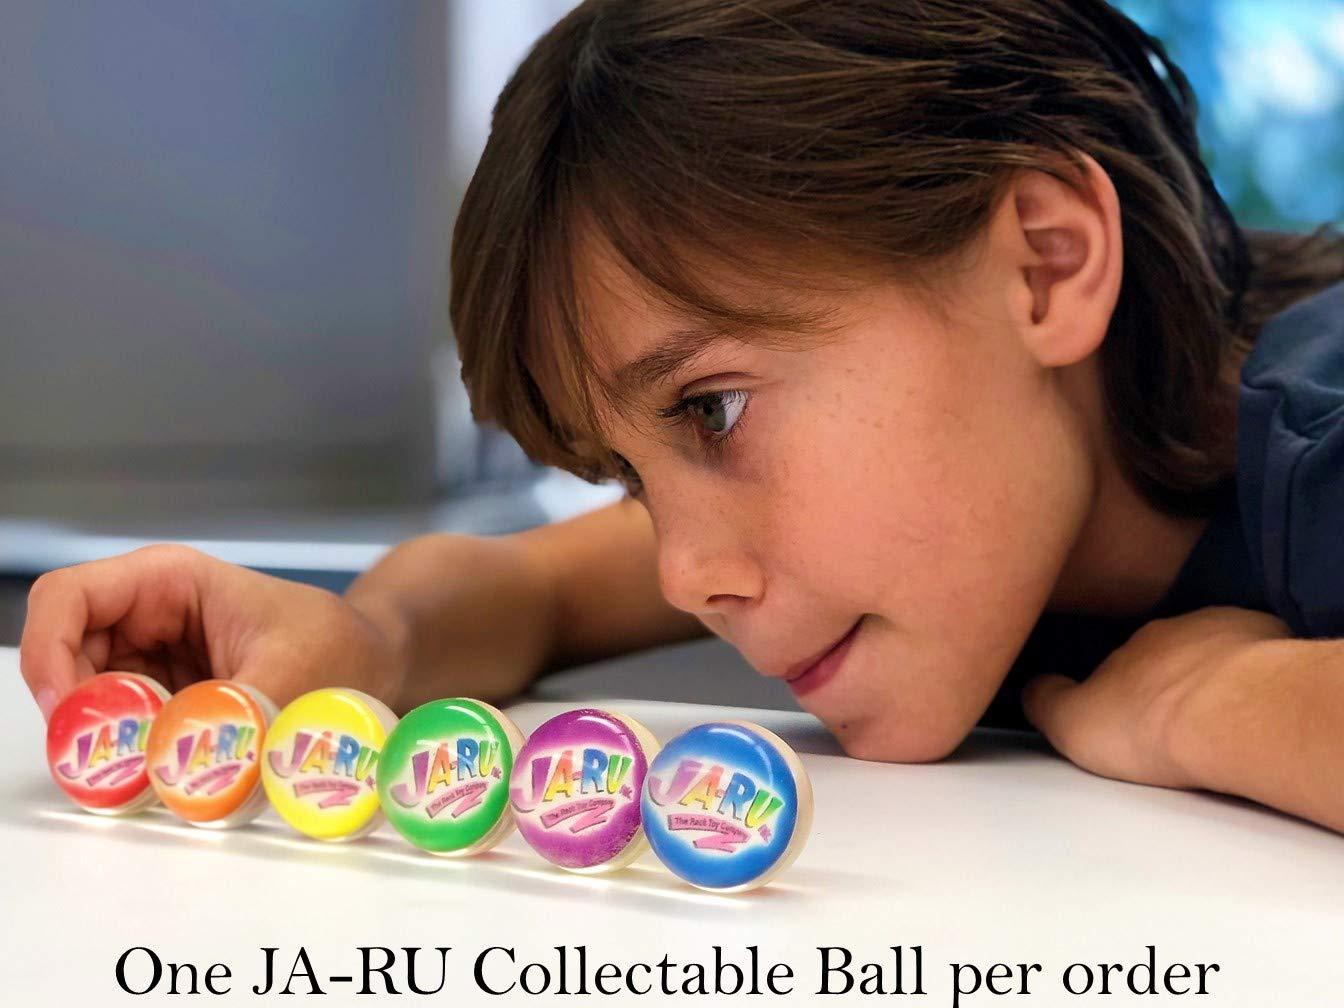 JA-RU Pinball Pocket Travel Game (144 Units) and one Bouncy Ball Item #3258-144p by JA-RU (Image #6)